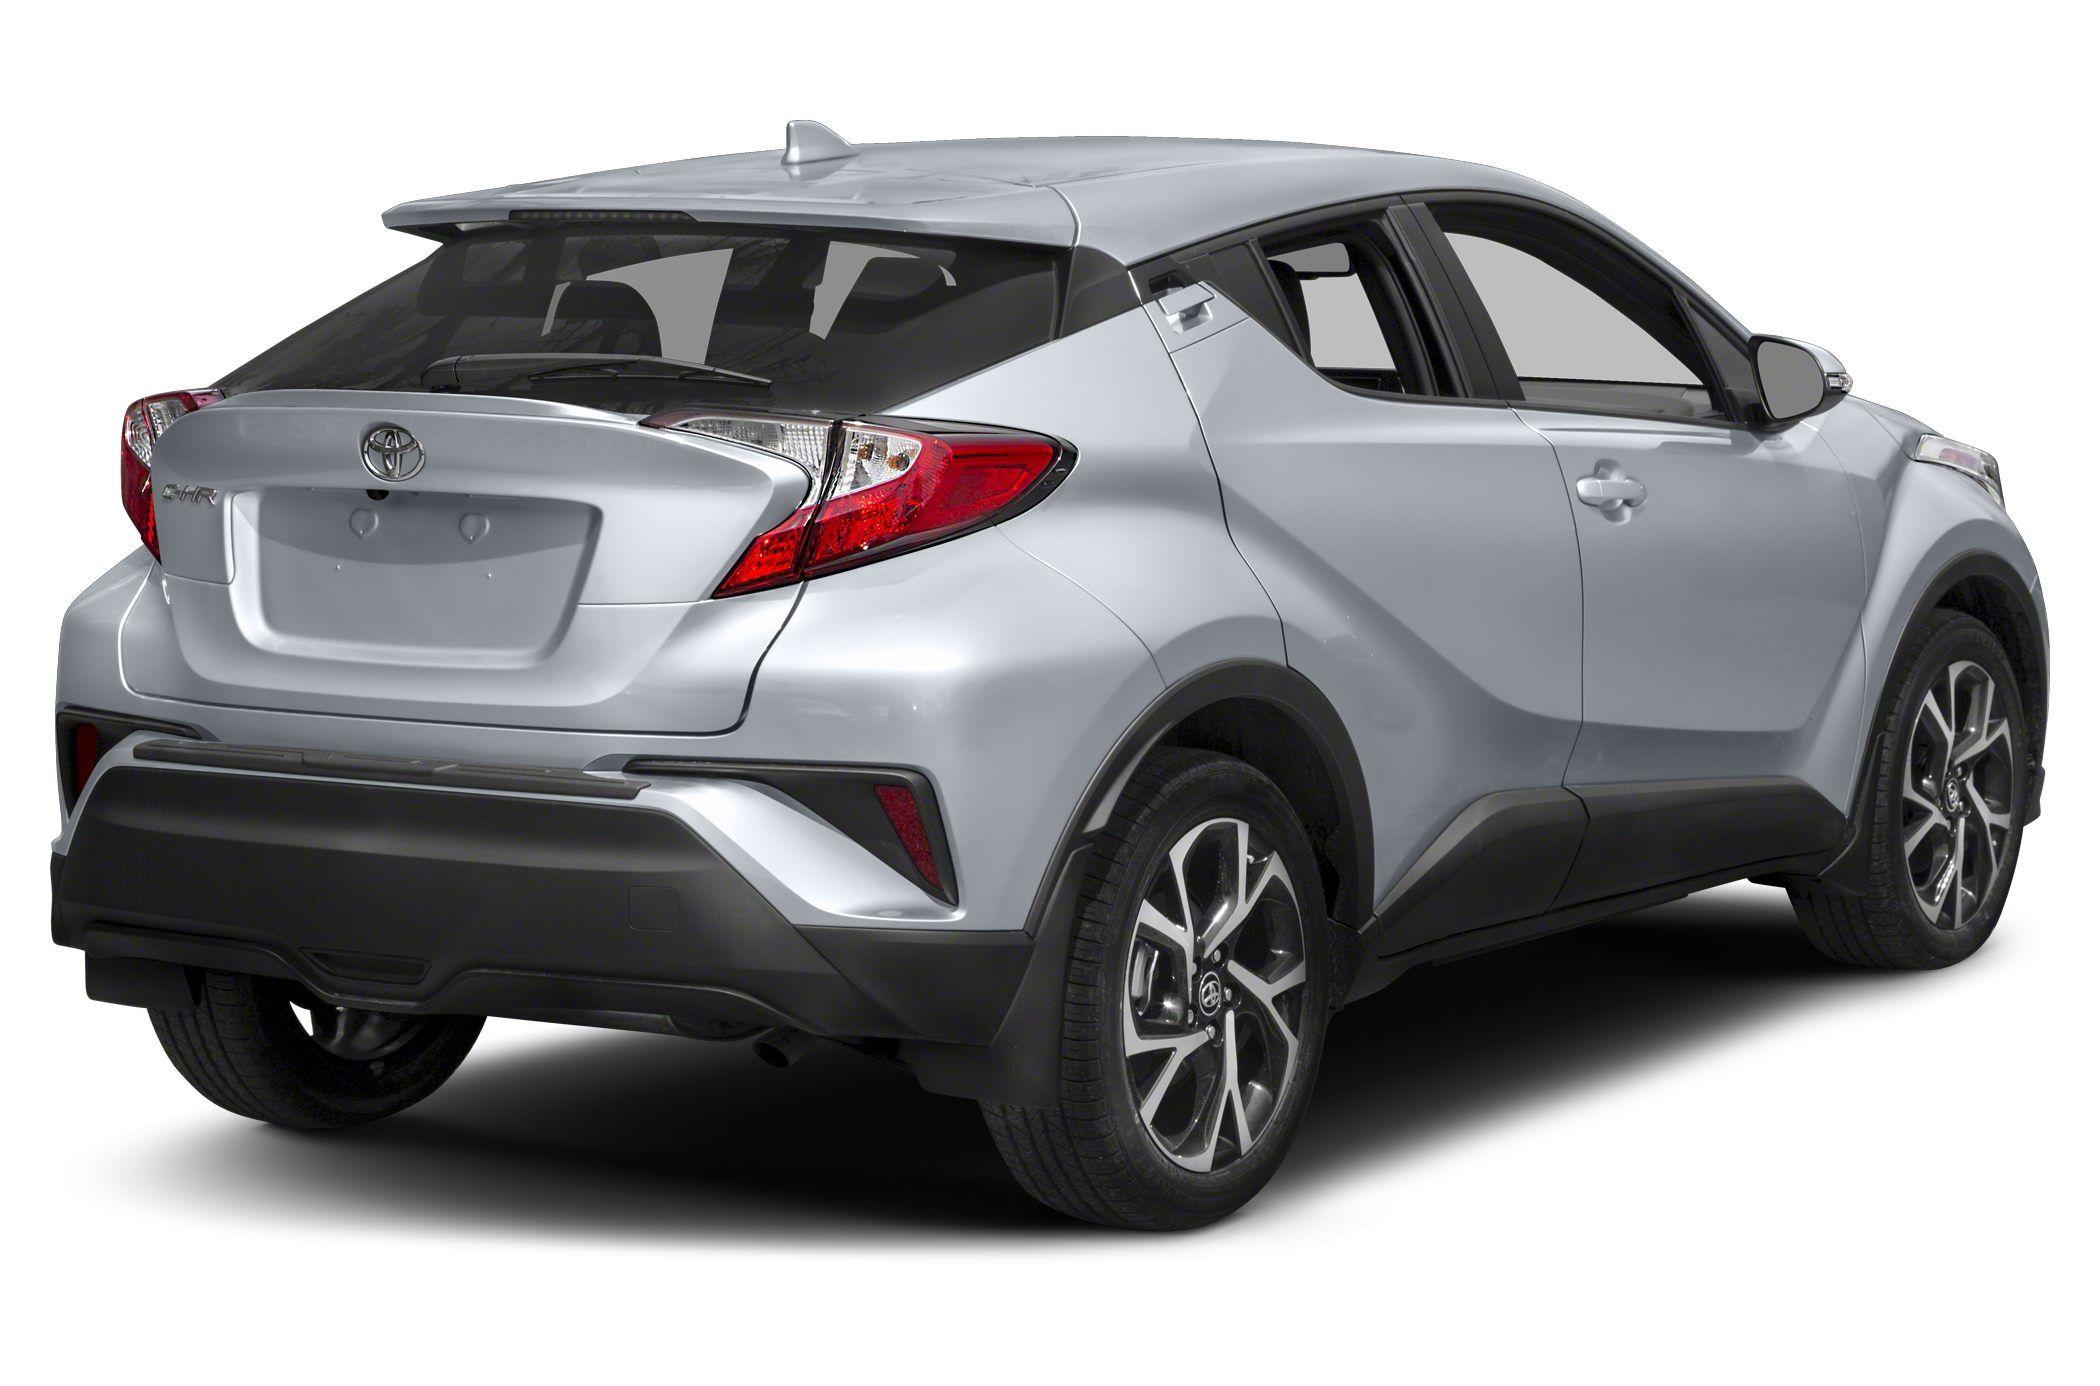 Best 2019 Toyota Suv New Release Toyota Suv Toyota Suv Models Suv